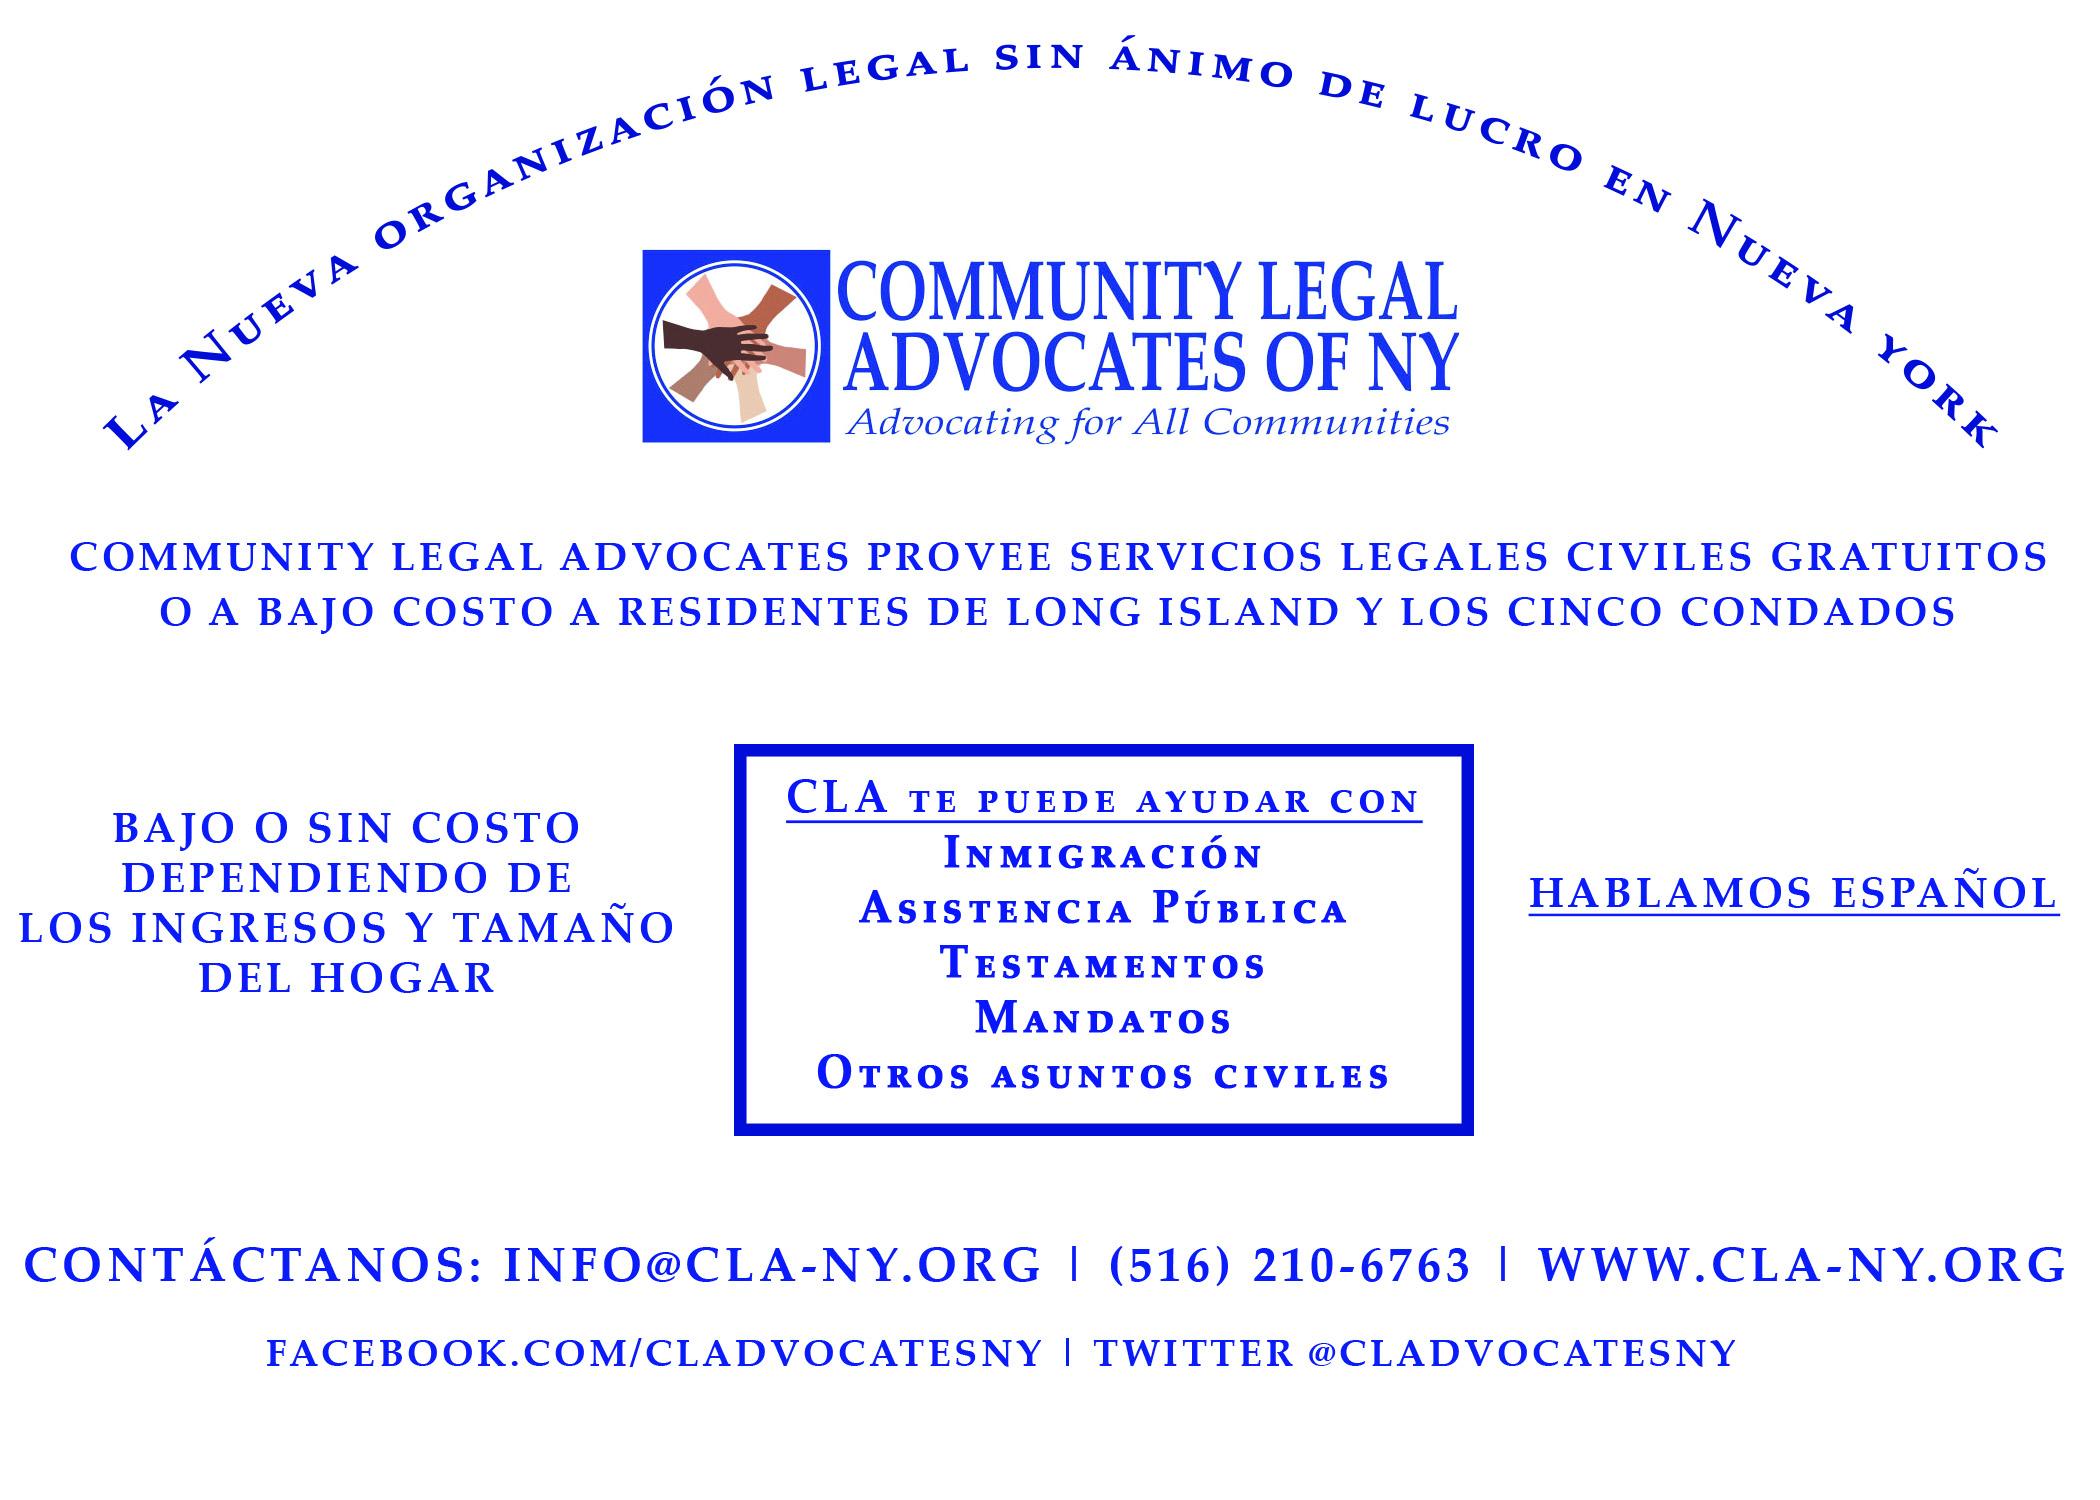 CLAinfopostcardSpanish.jpg